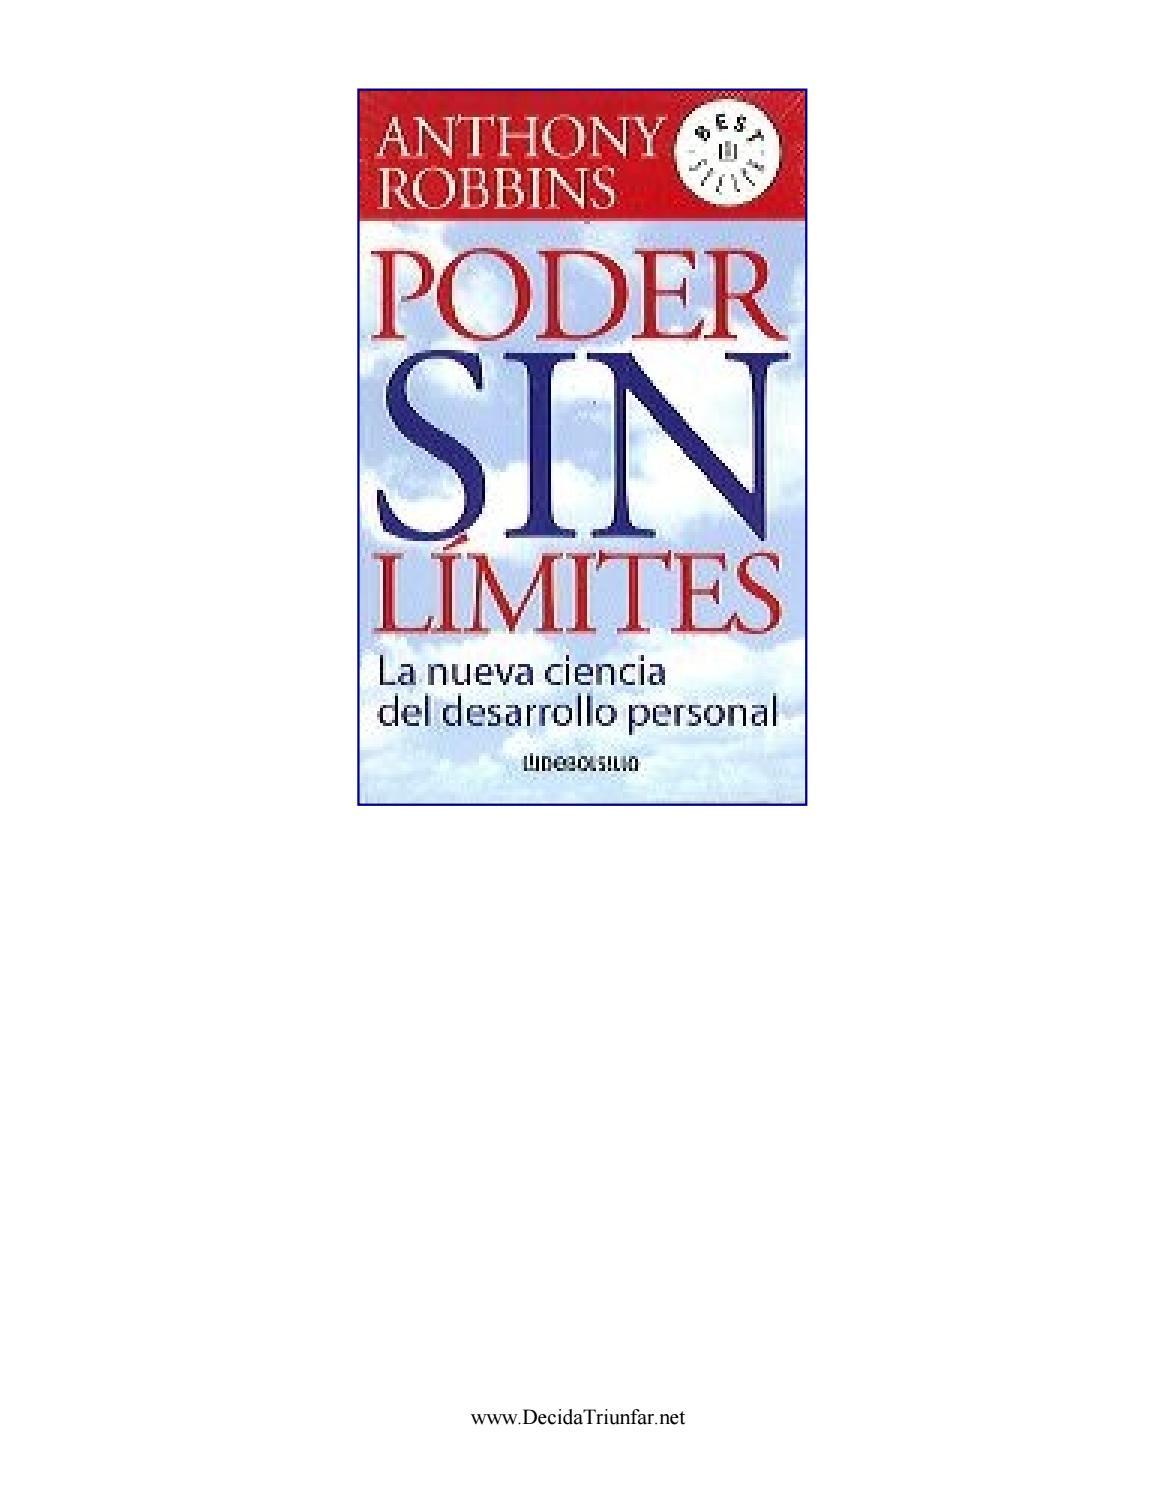 Poder sin limites anthony robbins by Germain Ri - issuu